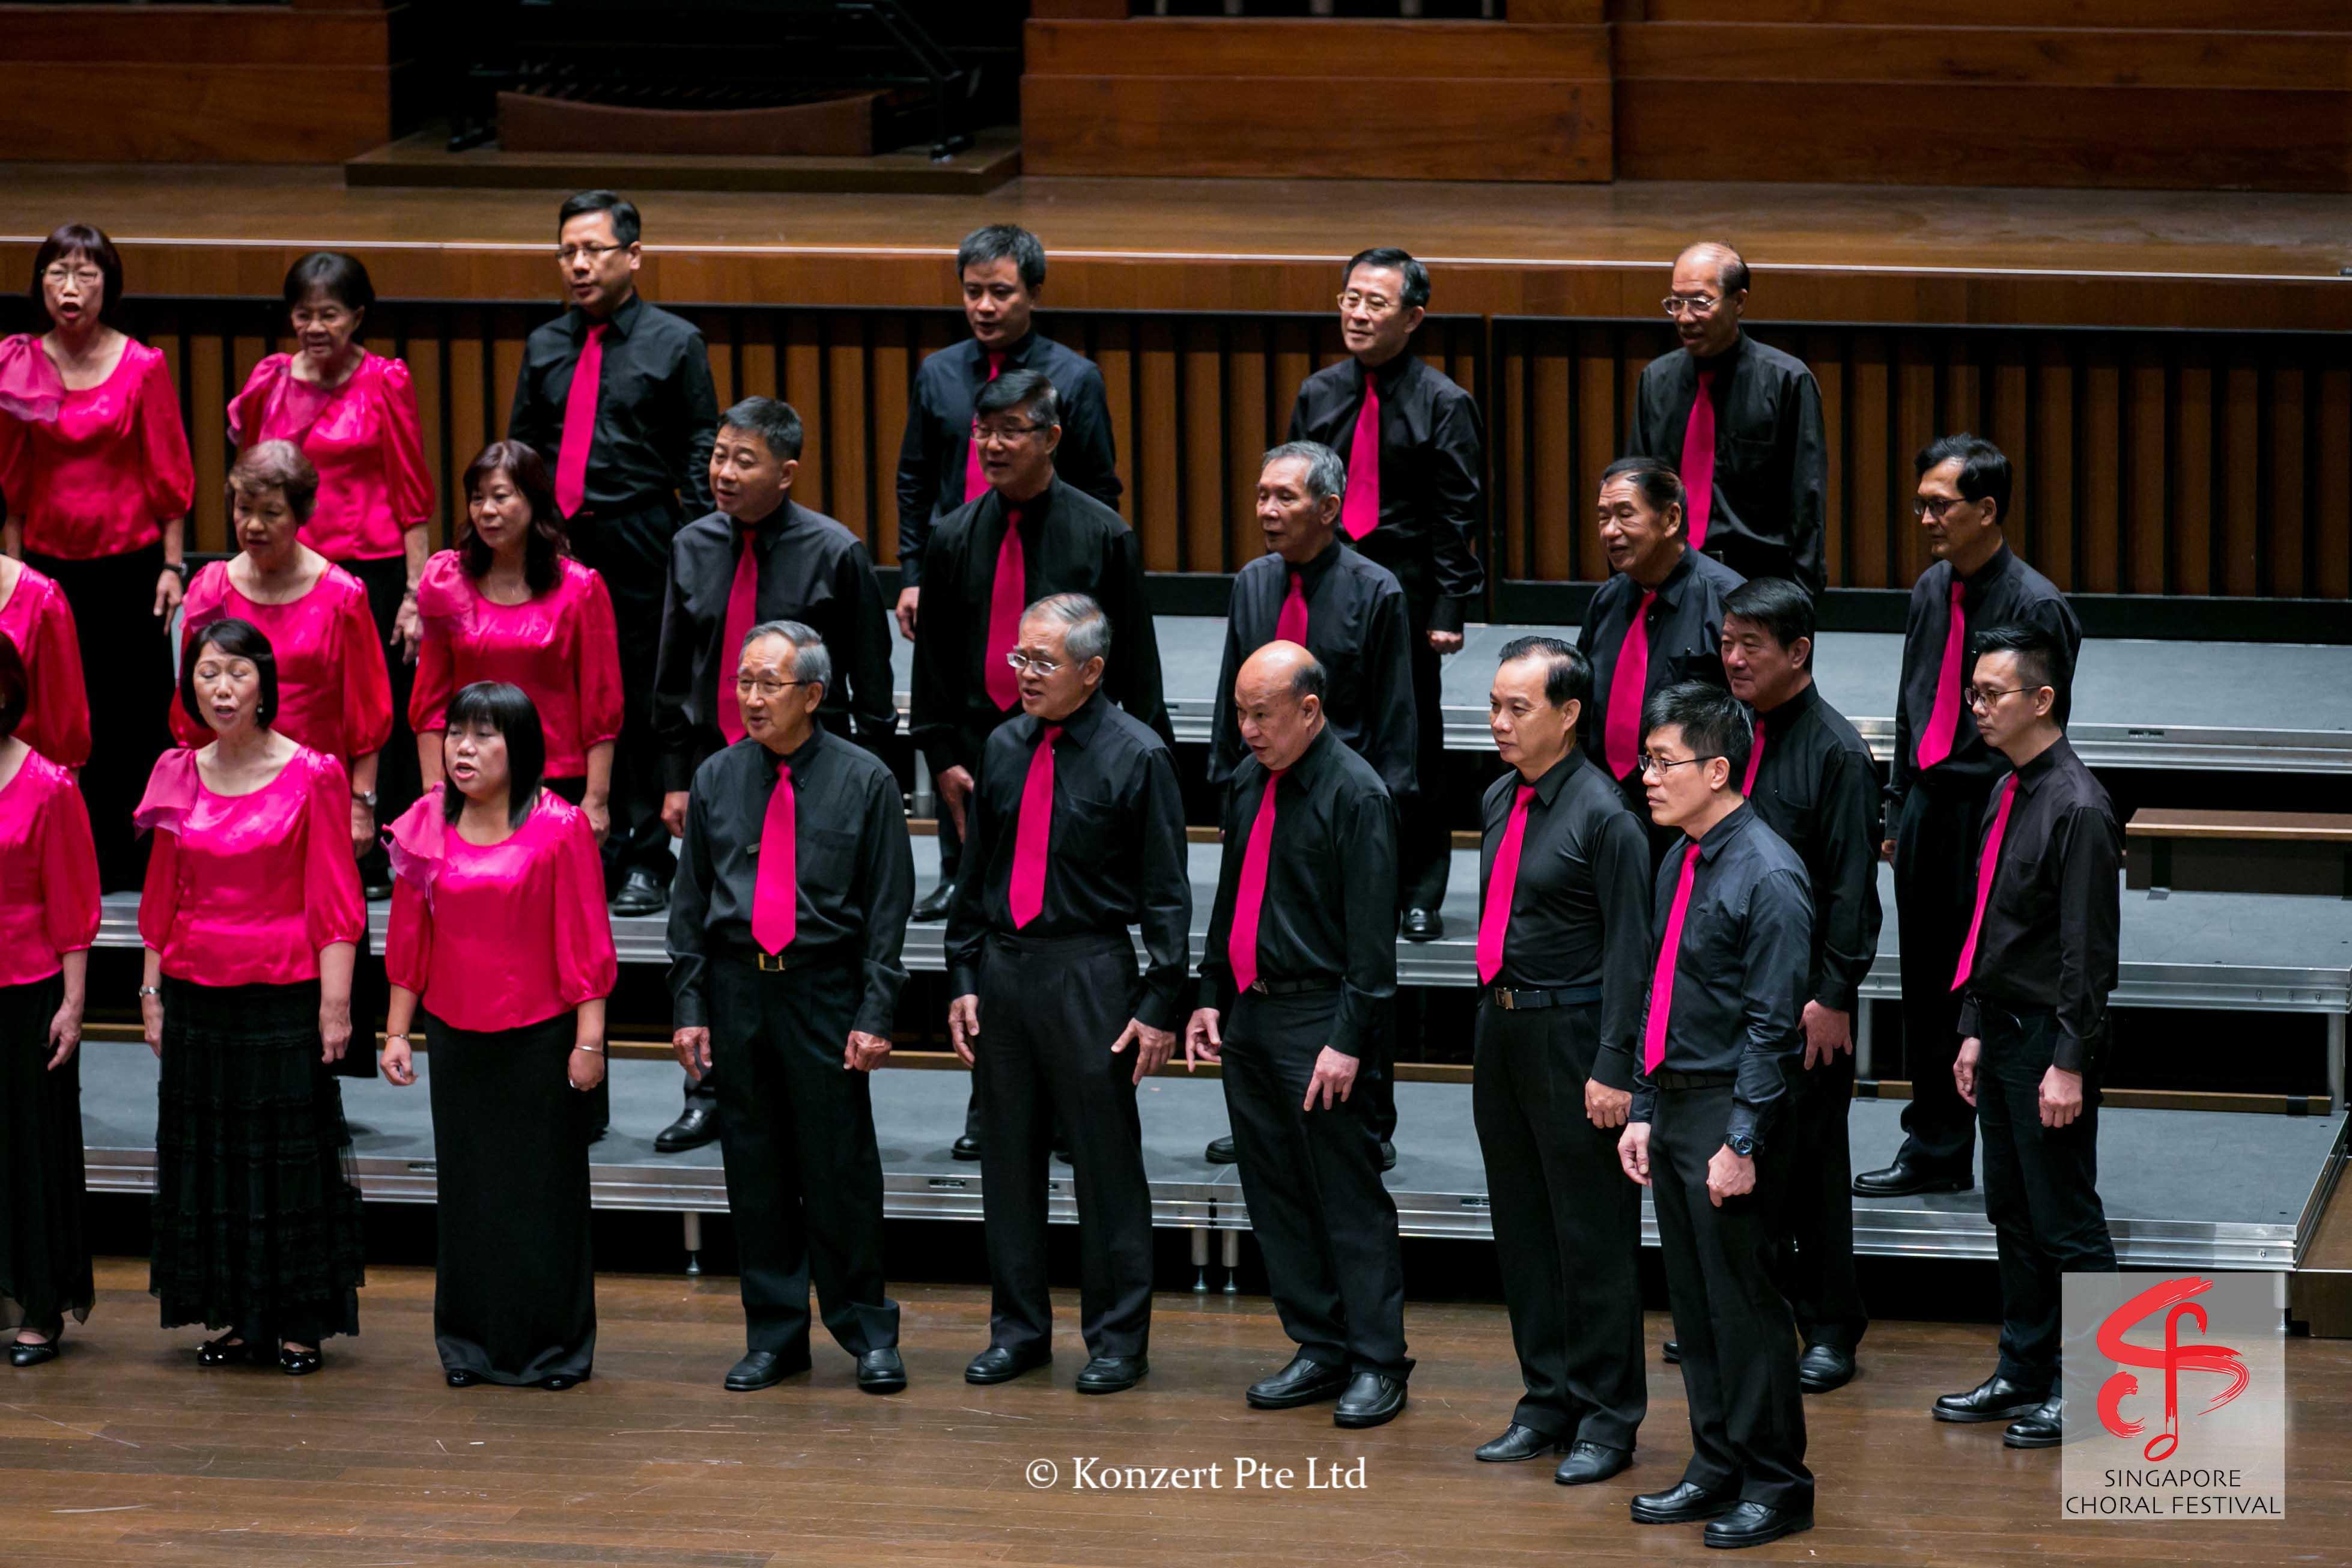 Singapore Choral Festival 7-8-15 (251).jpg